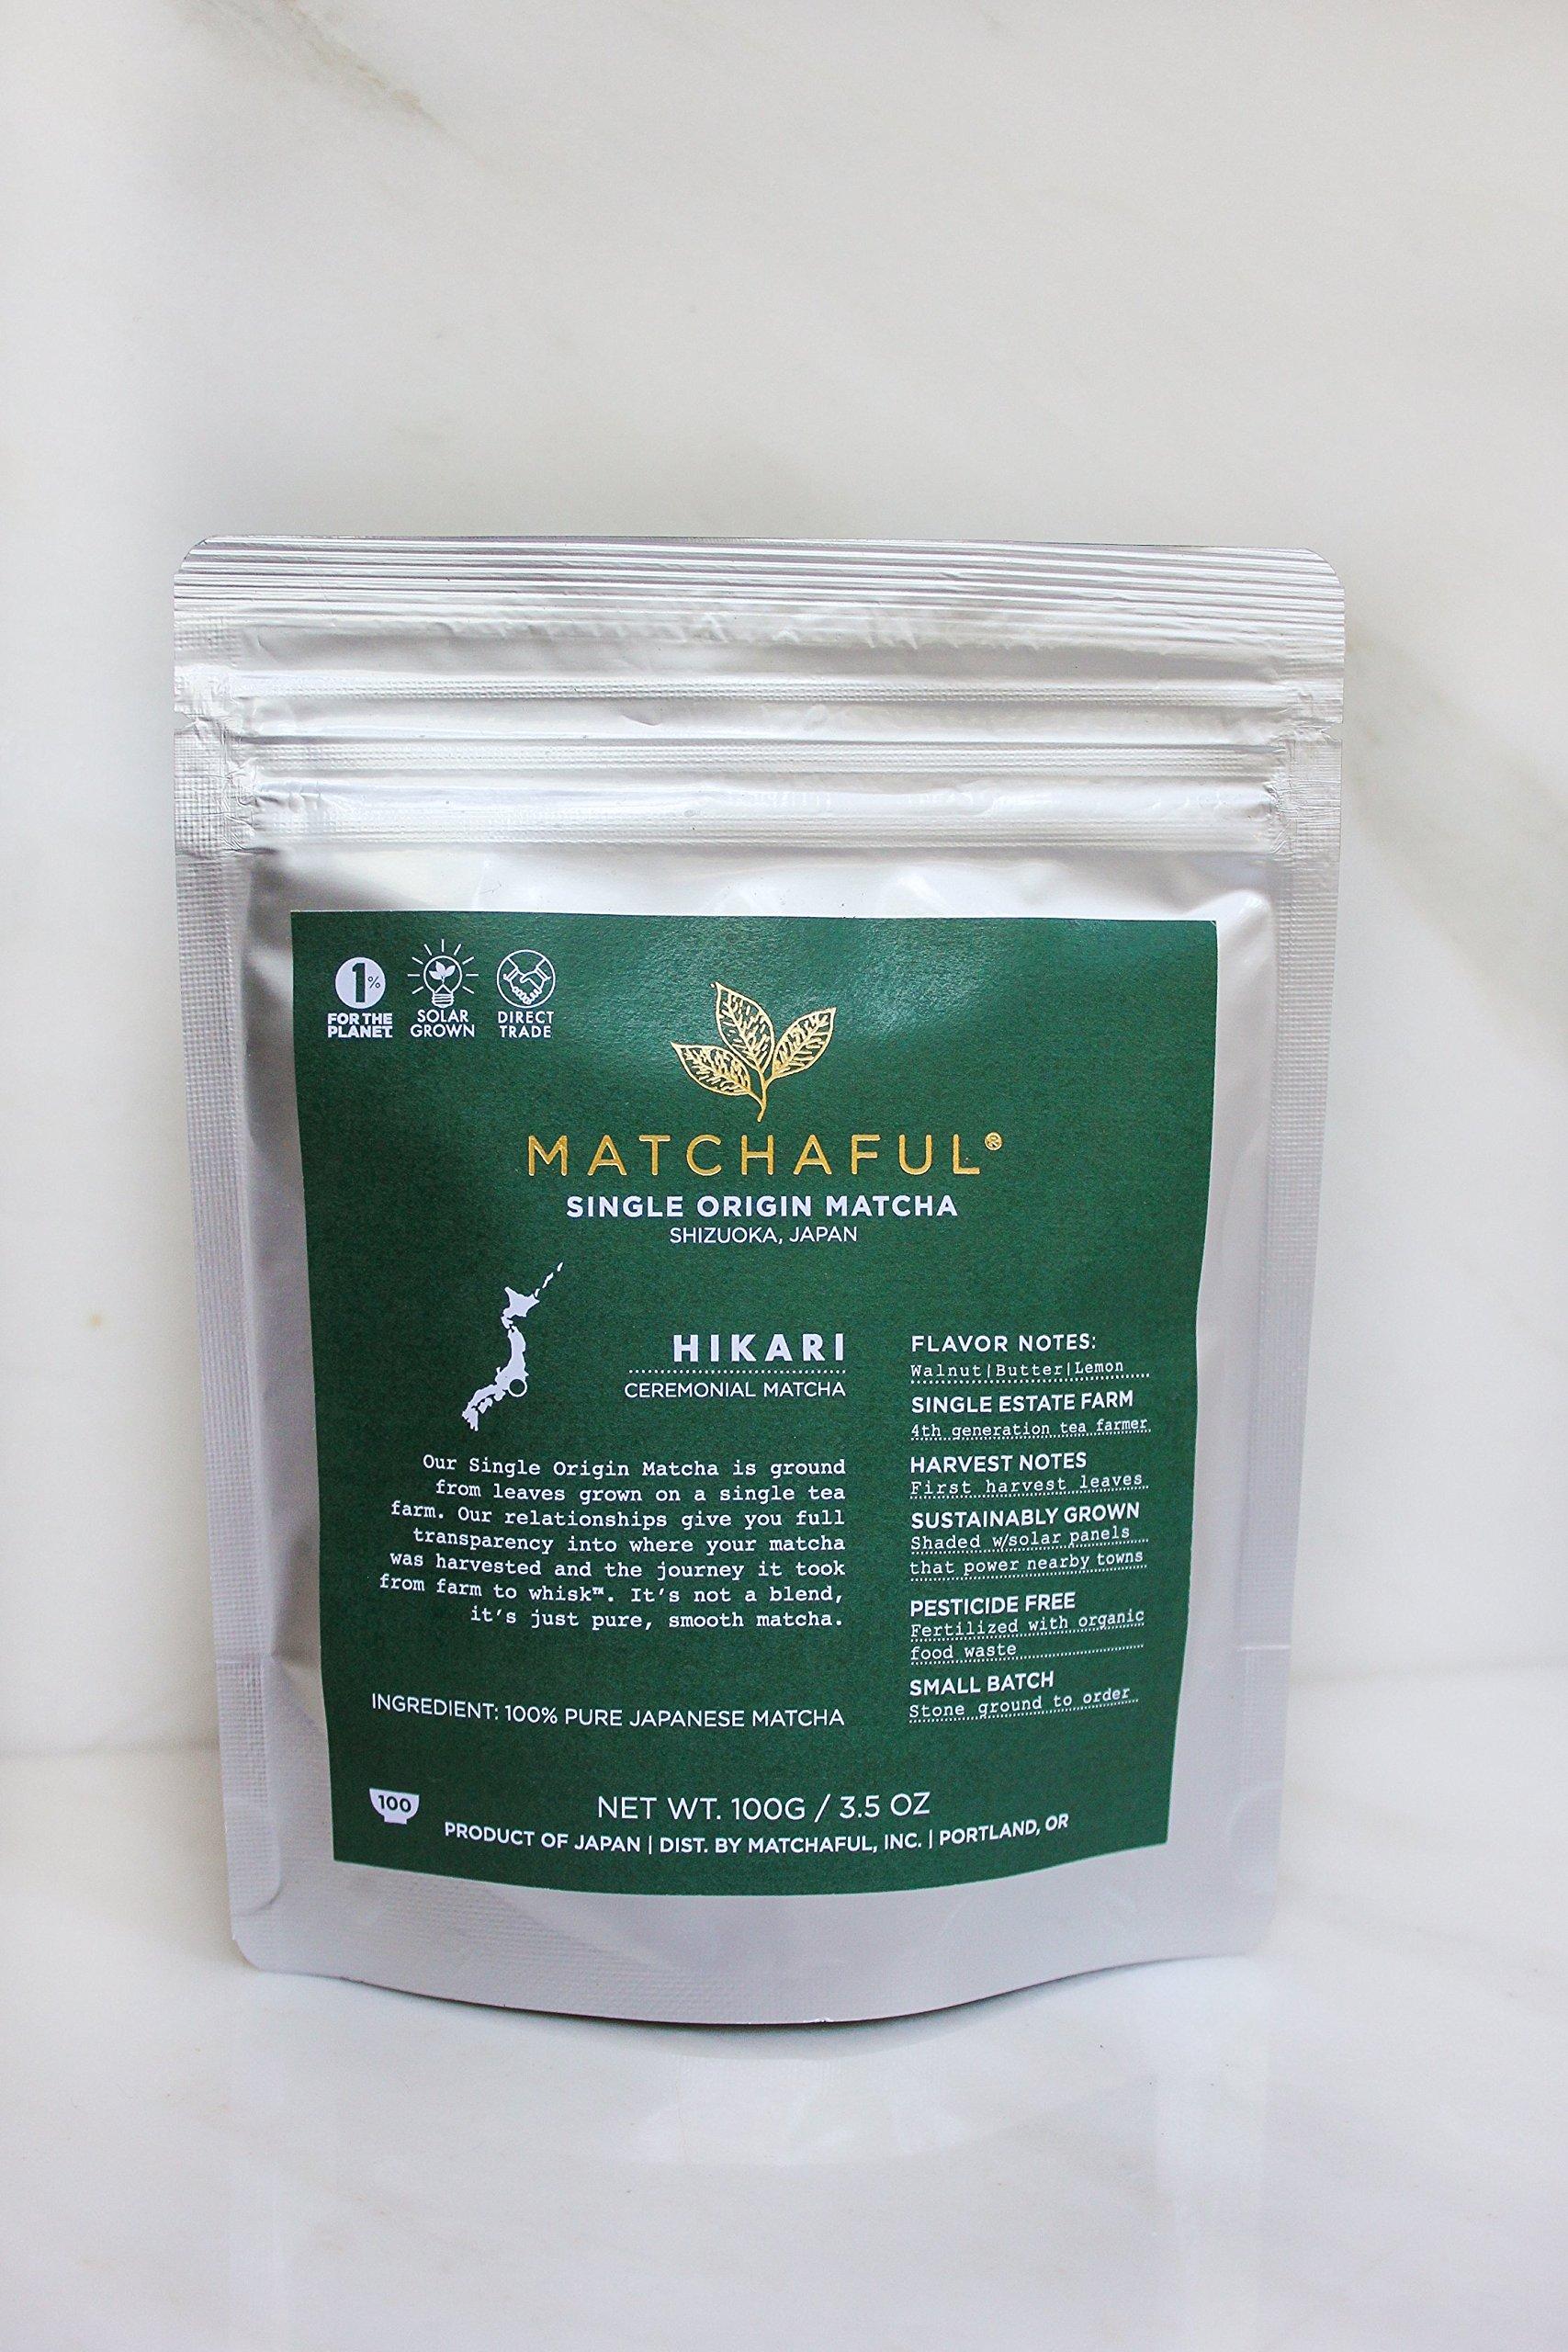 MATCHAFUL Hikari Single Origin Organic Ceremonial Matcha, 100 Gram by MATCHAFUL (Image #2)